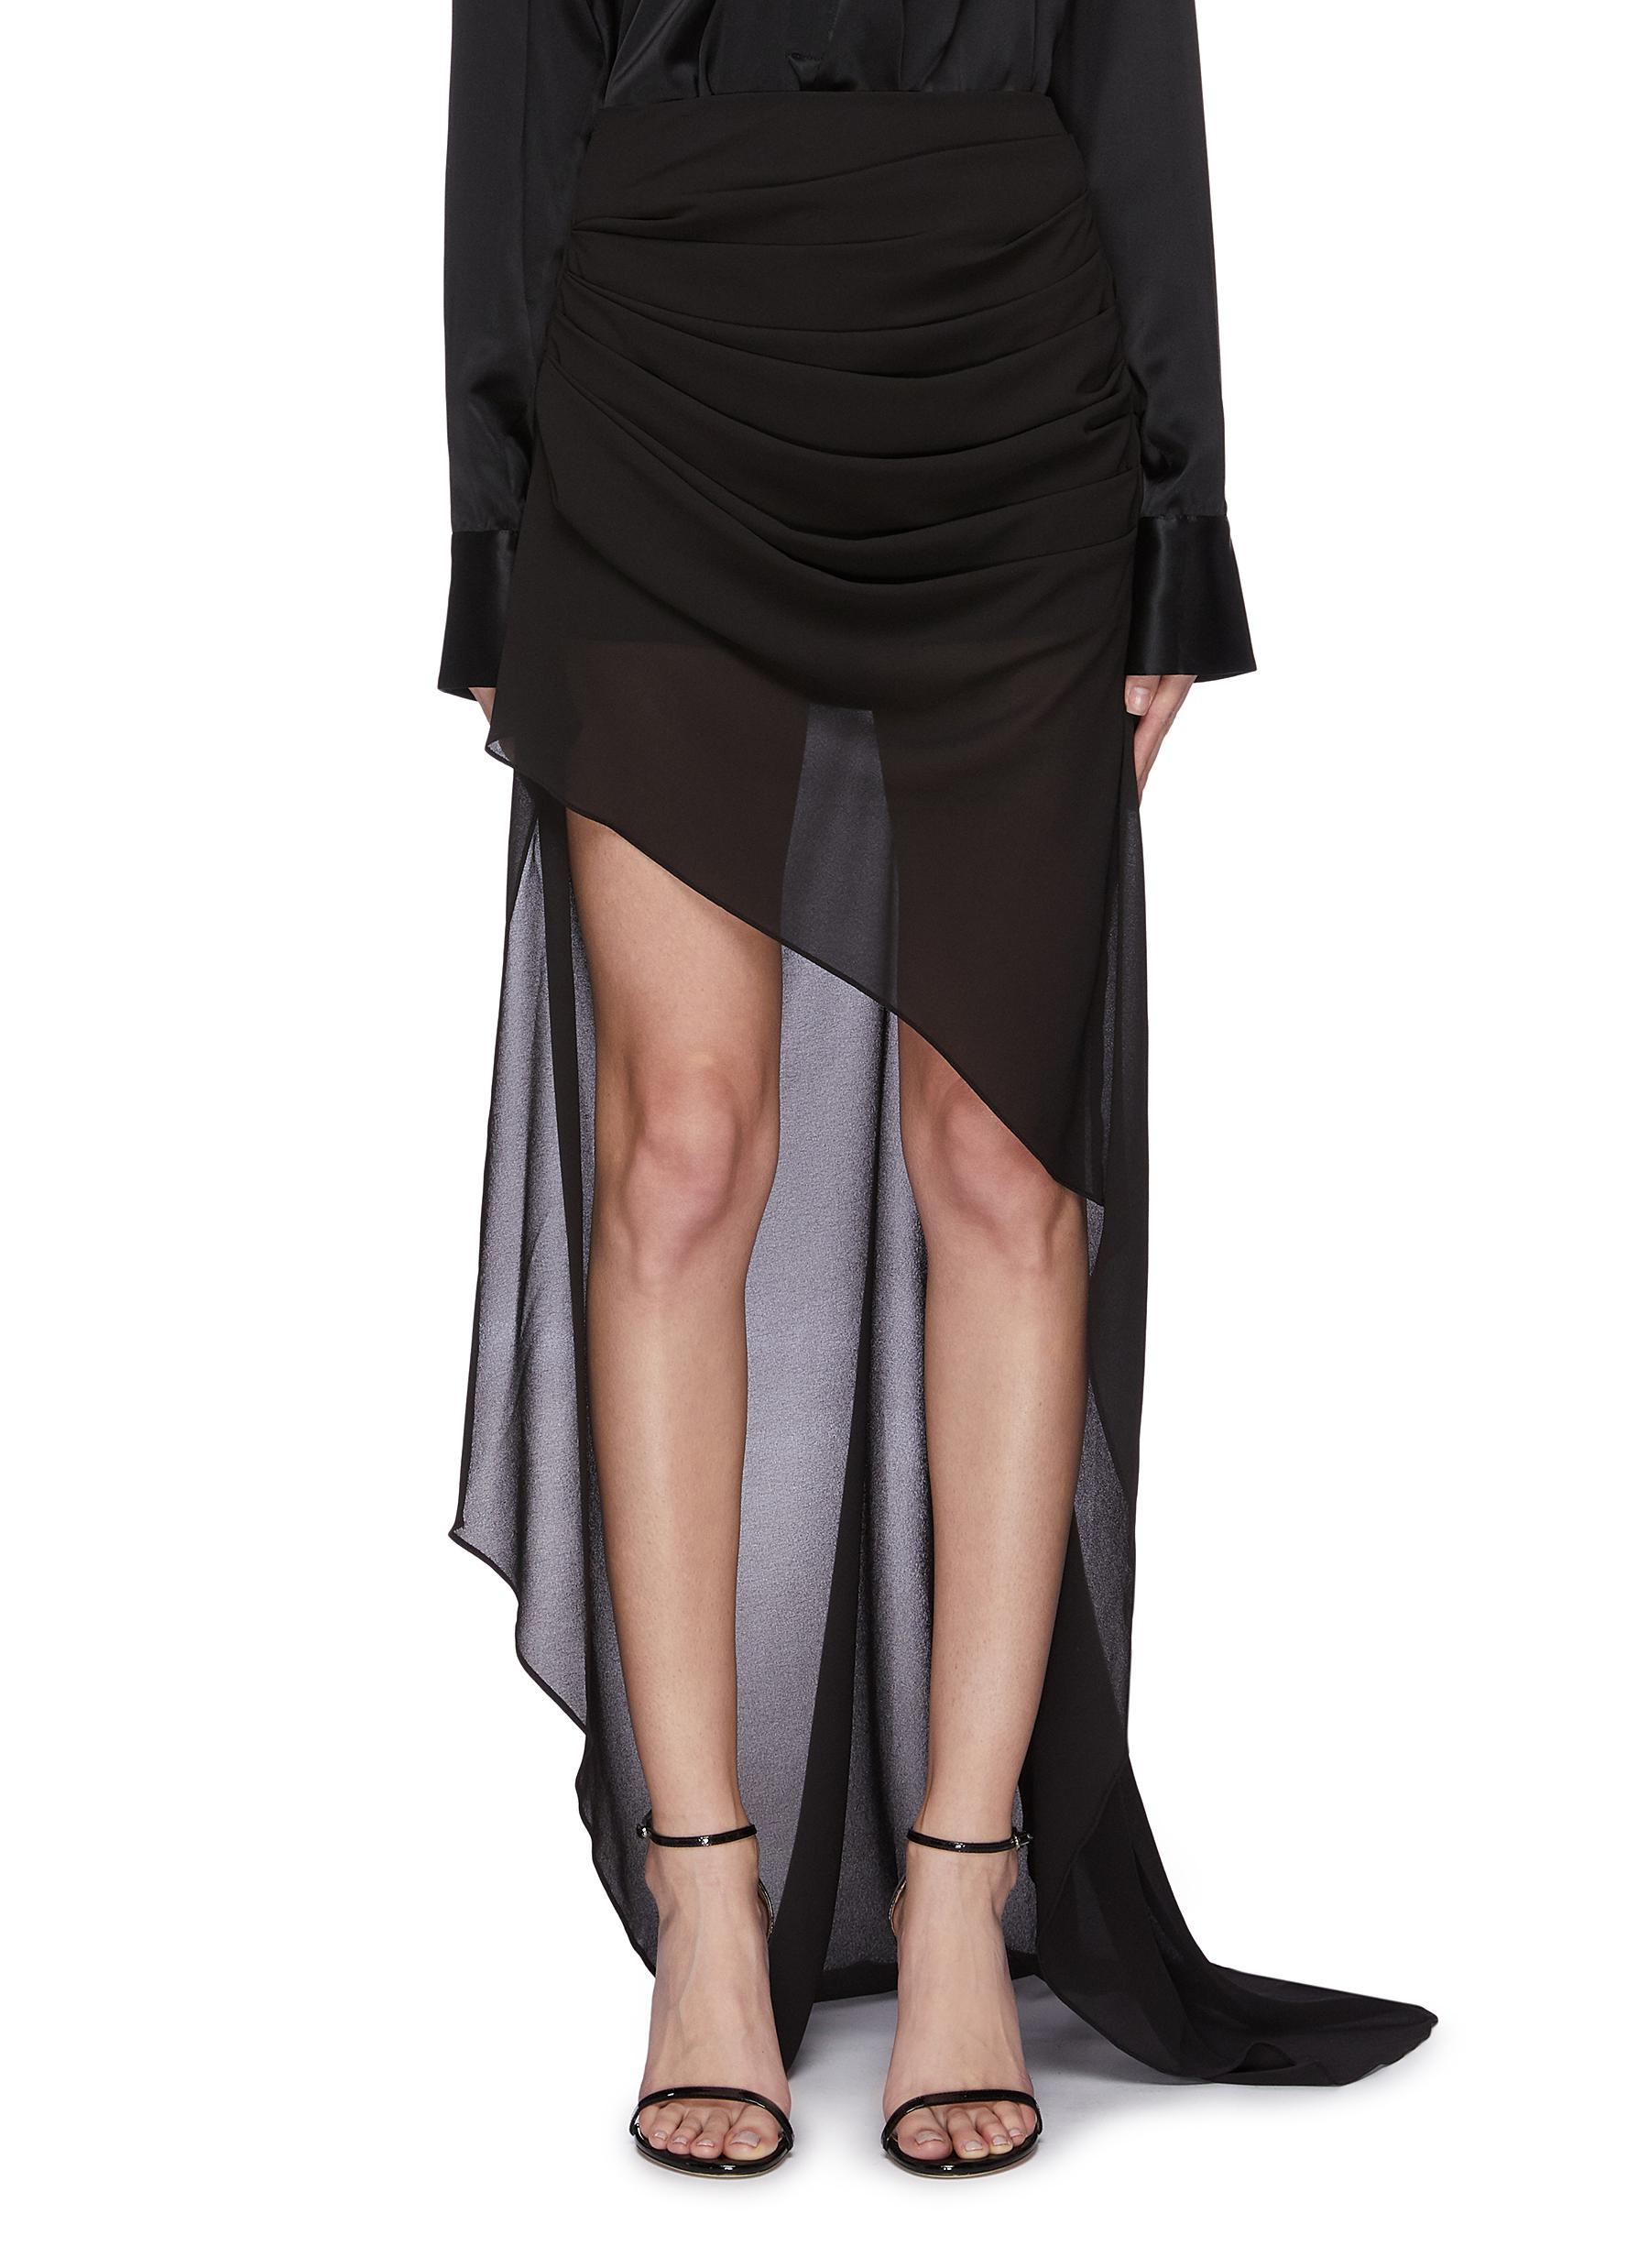 Buy 16Arlington Skirts 'Aster' asymmetric drape sheer maxi skirt